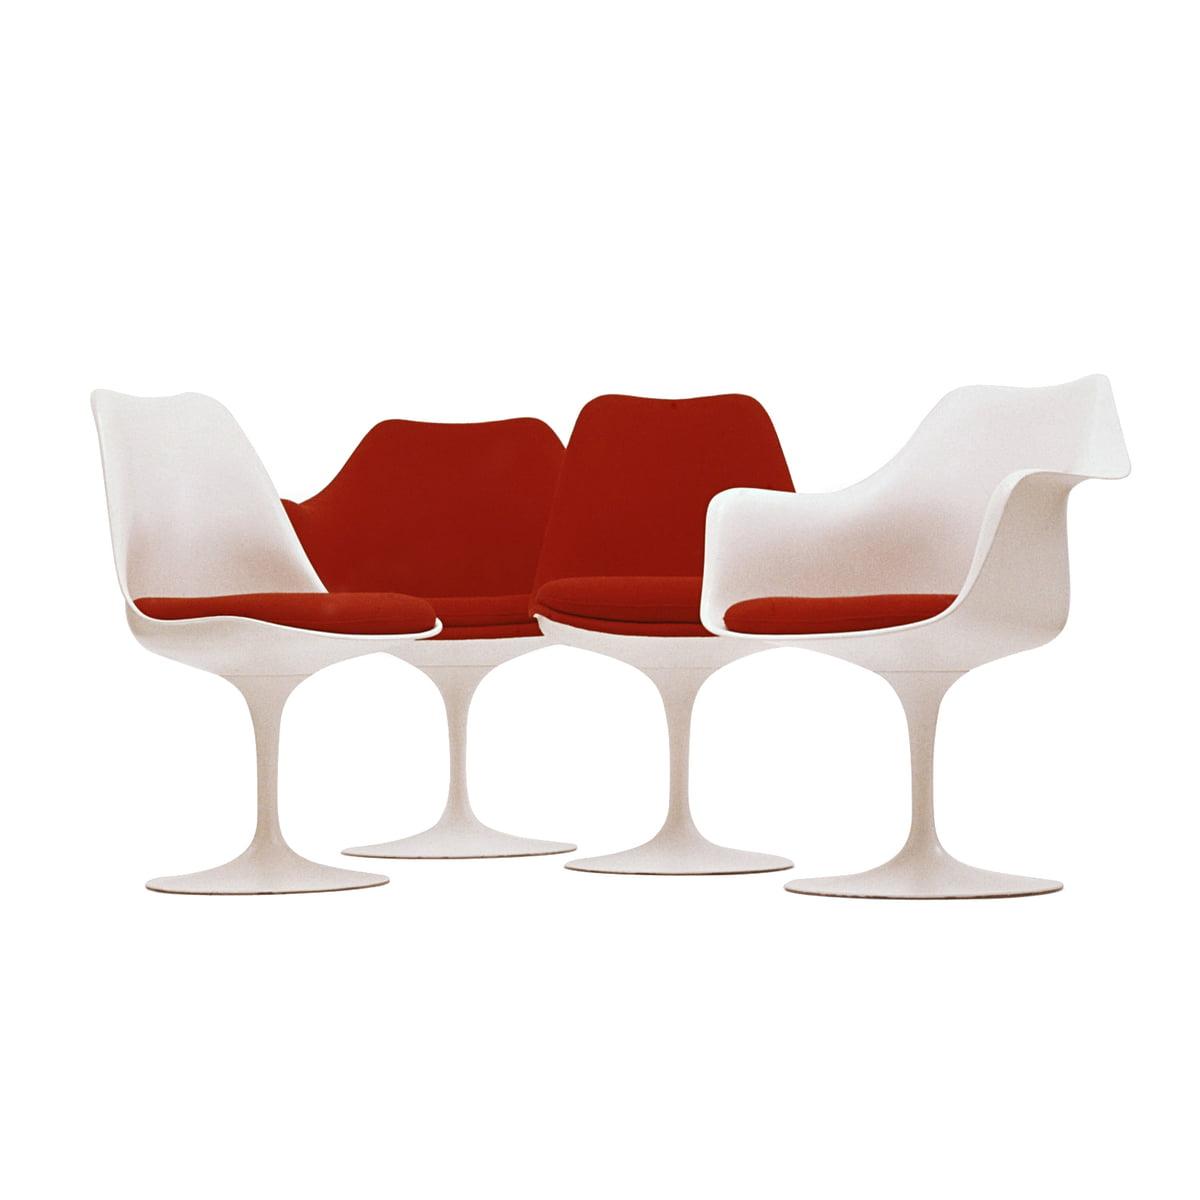 Knoll Saarinen Tulip Chair Swivelling White Cushion Tonus Black 128